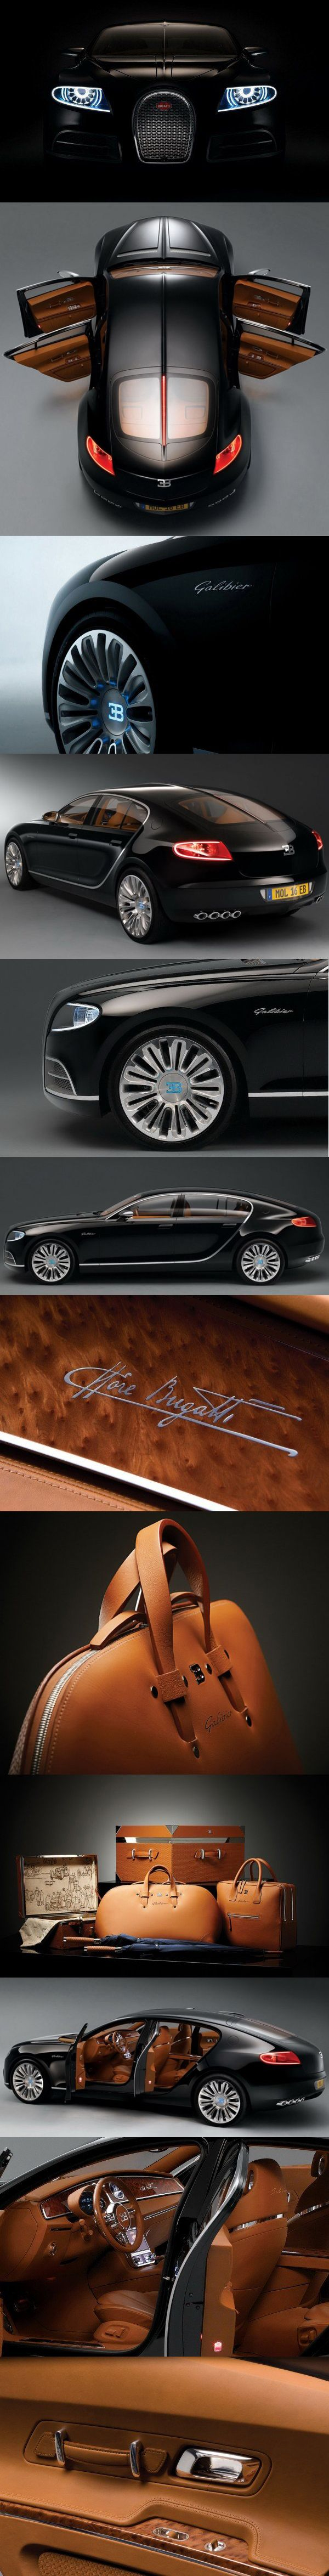 BUGATTI GALIBIER #LuxuryCars #VintageCars #SportCars #ConceptCars